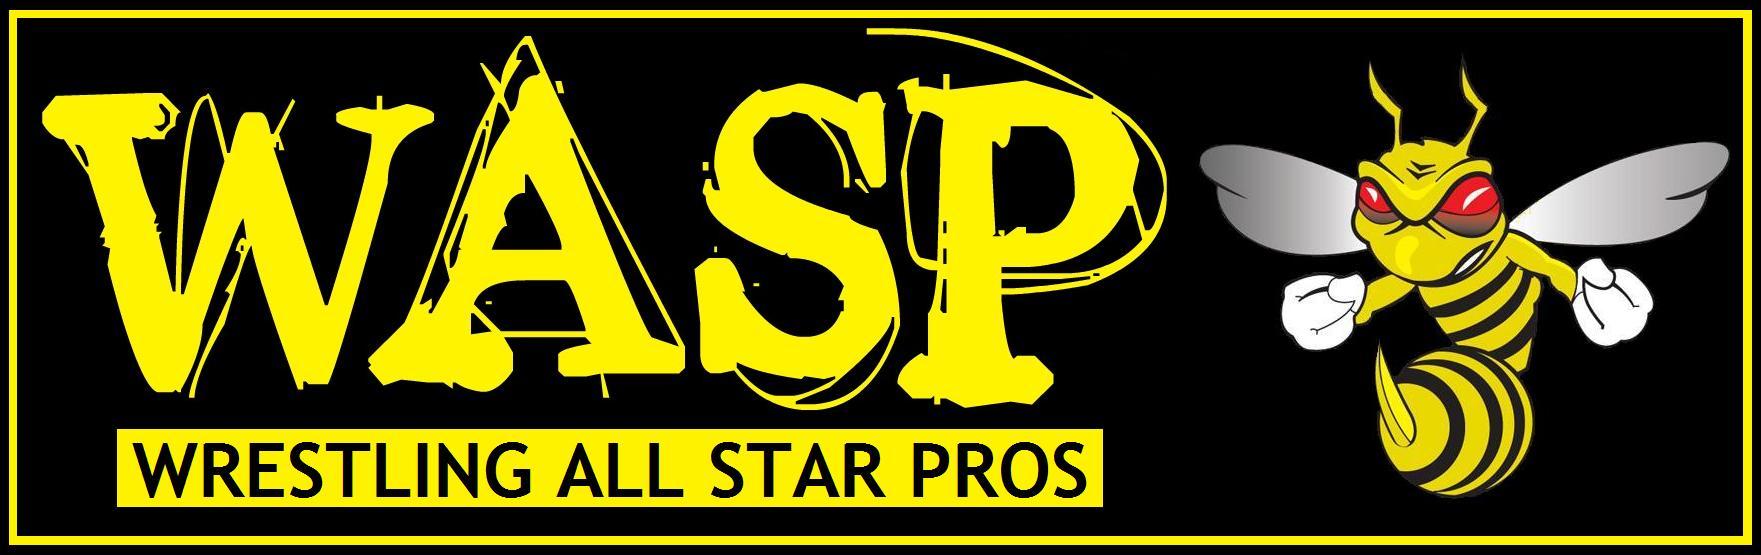 WASP - Wrestling All Star Pros